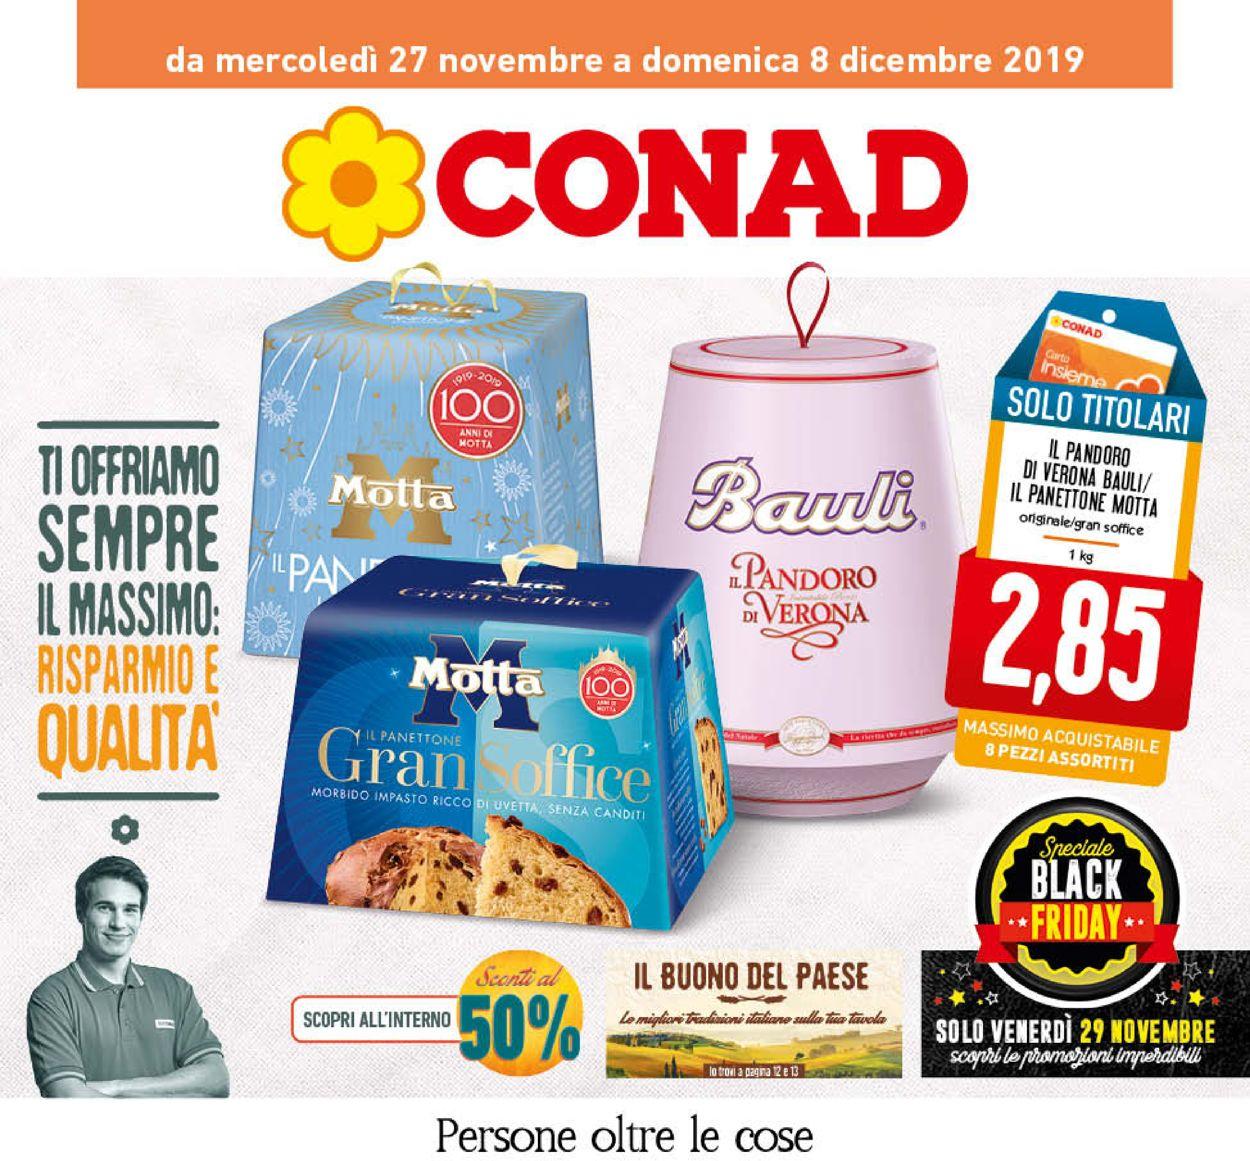 Volantino Conad - Black Friday 2019 - Offerte 27/11-08/12/2019